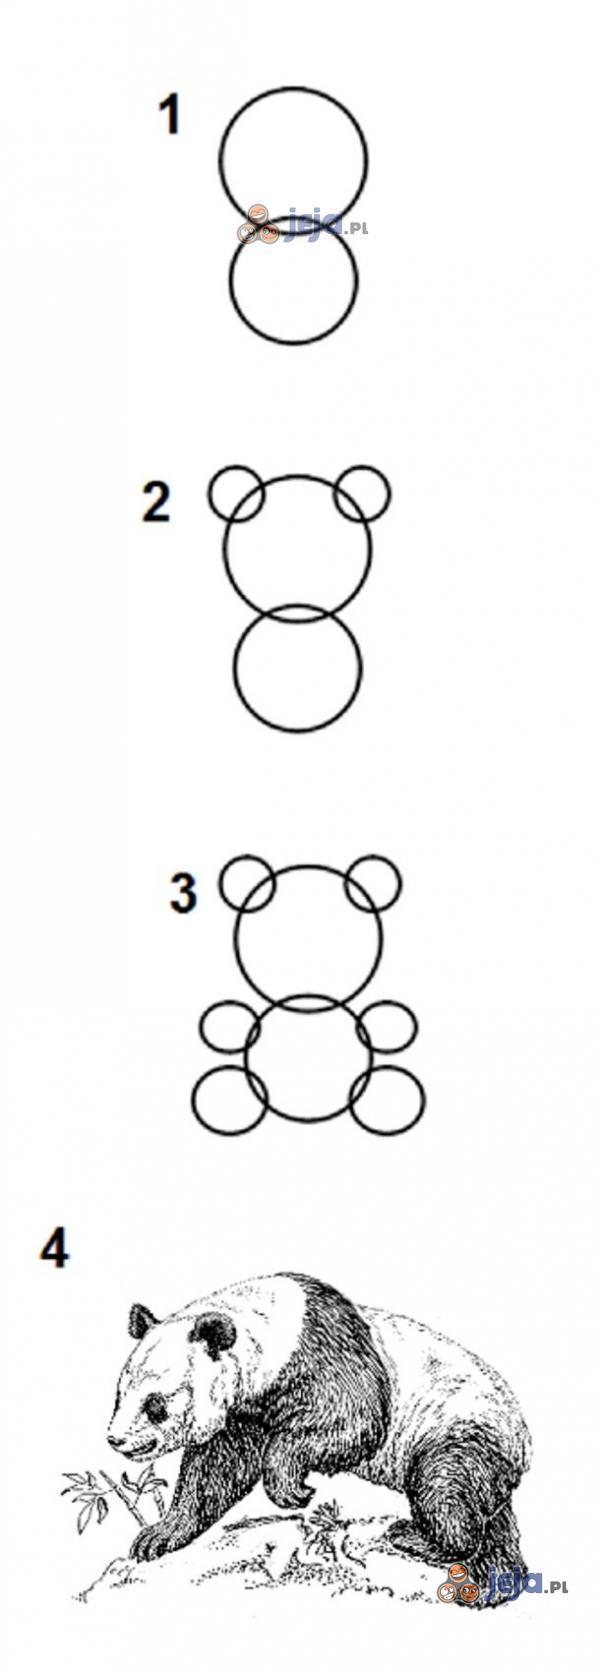 Poradnik: Jak narysować pandę